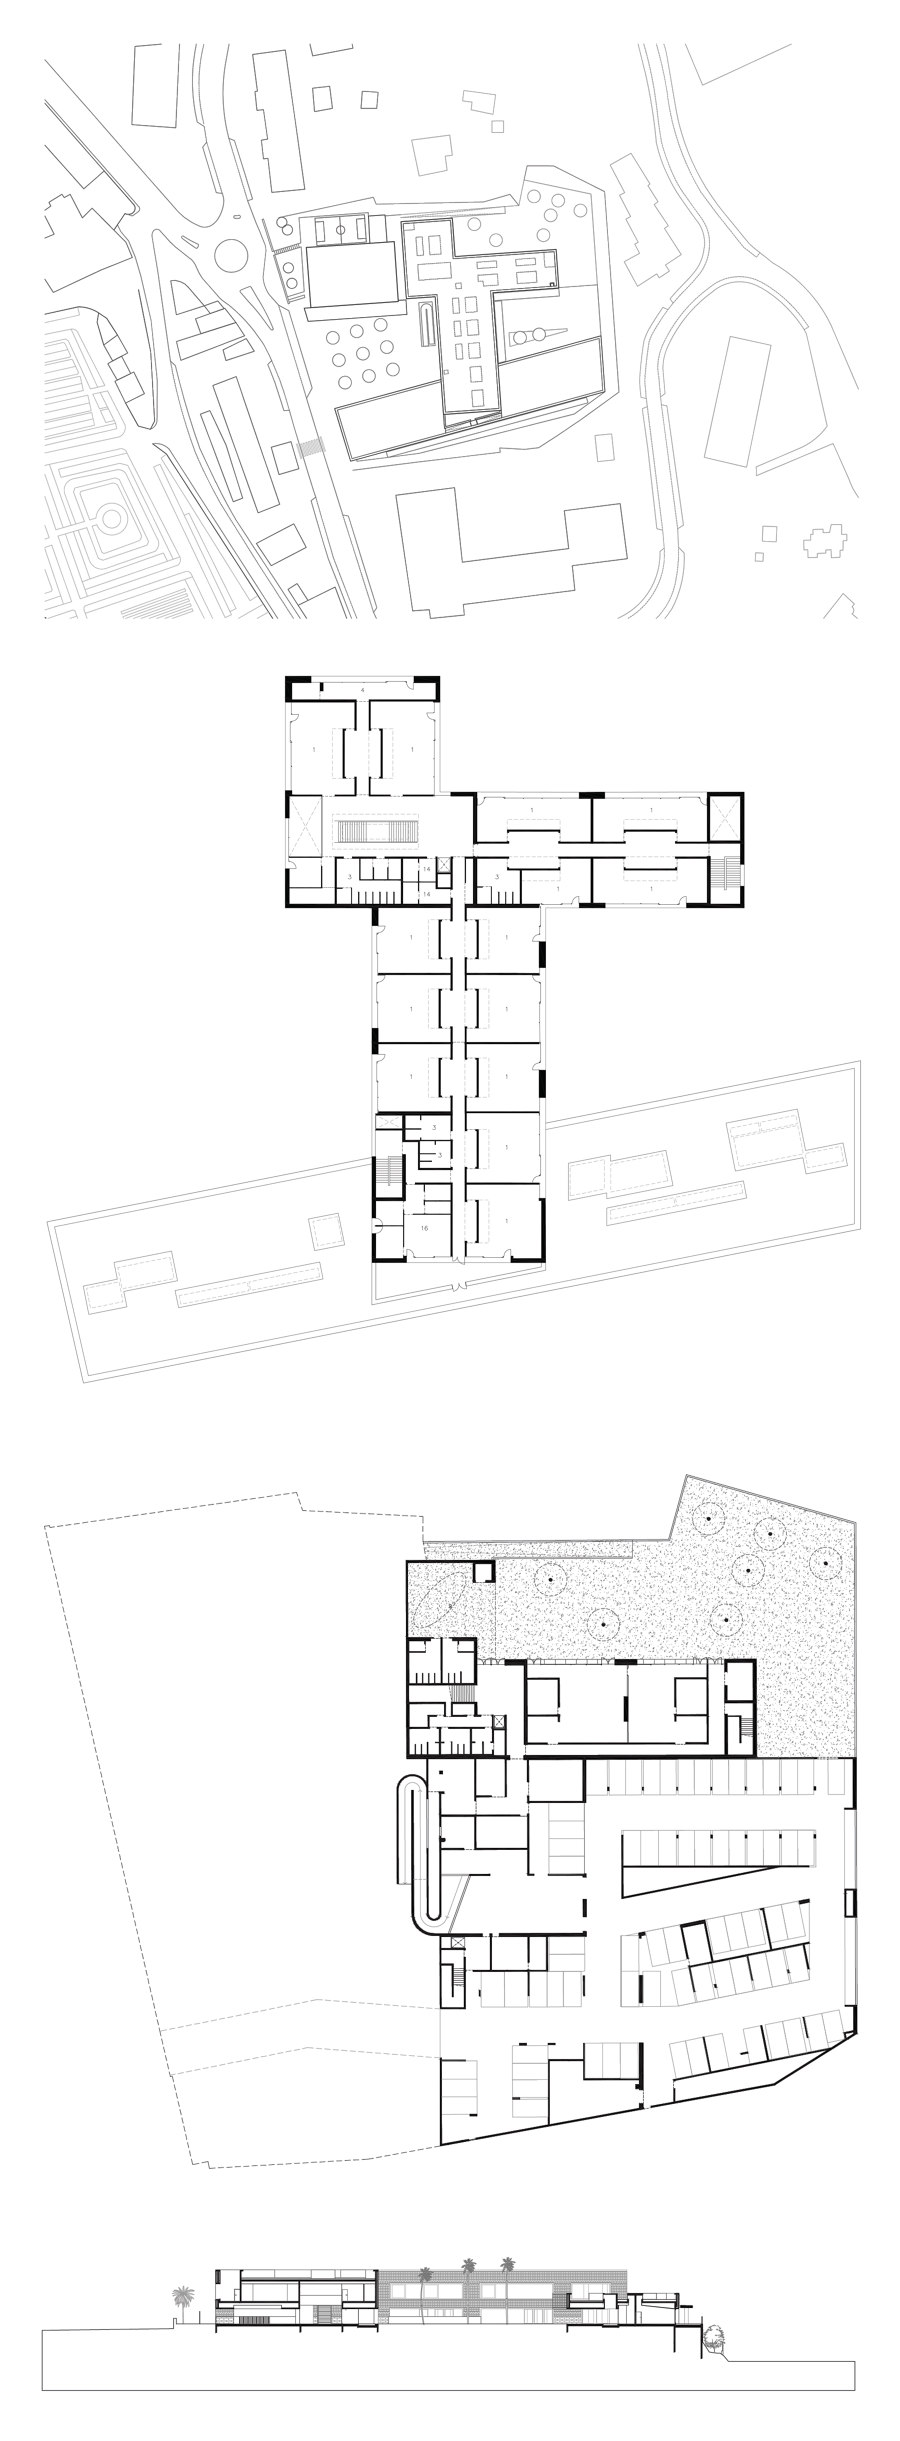 Ecole Communale Jacqueline de Romilly by Atelier Stéphanie Fernandez | Schools